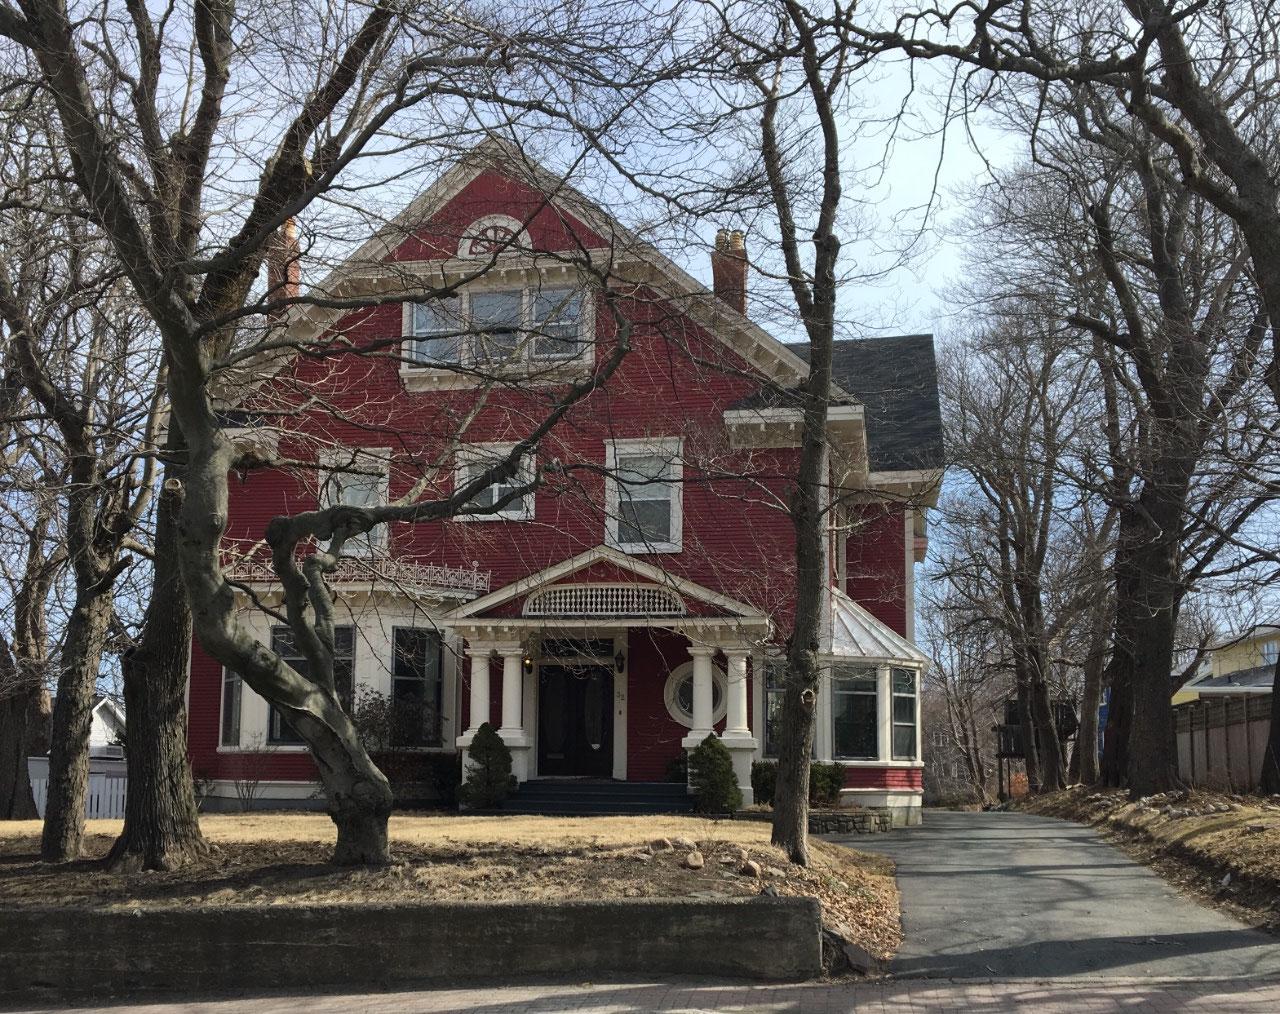 Allan Hawco's House